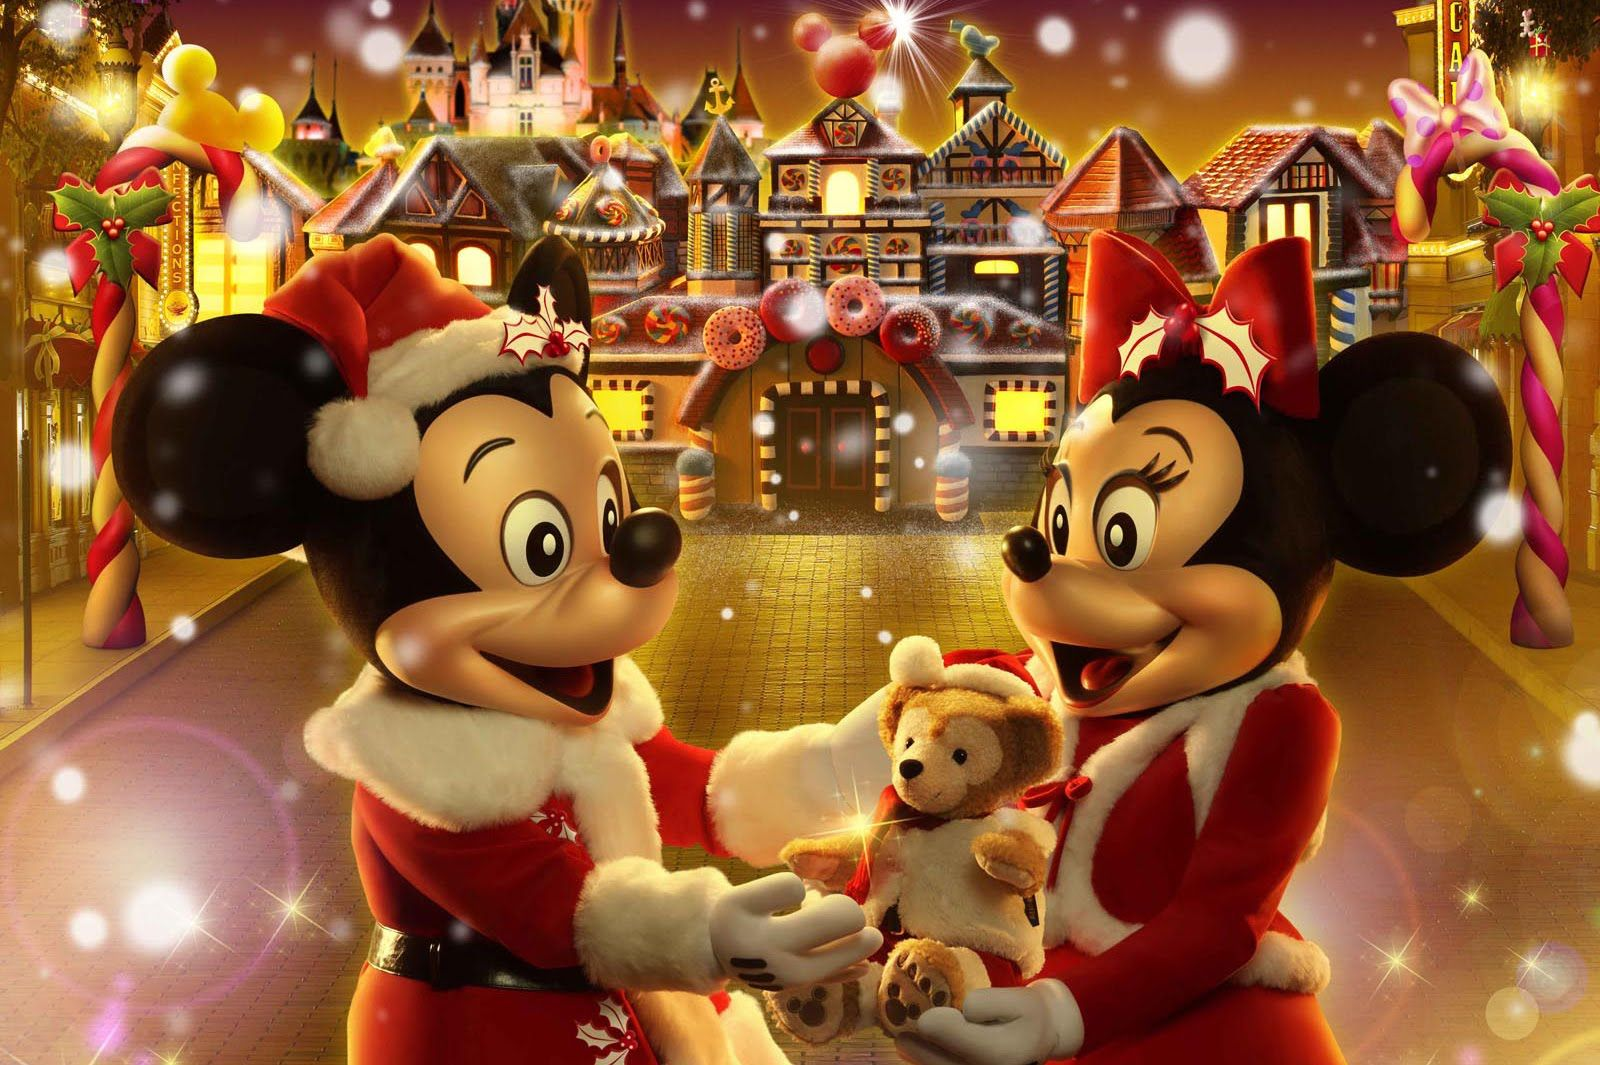 Disney christmas decorations for home - Disney Christmas Decorations Bennett Farms